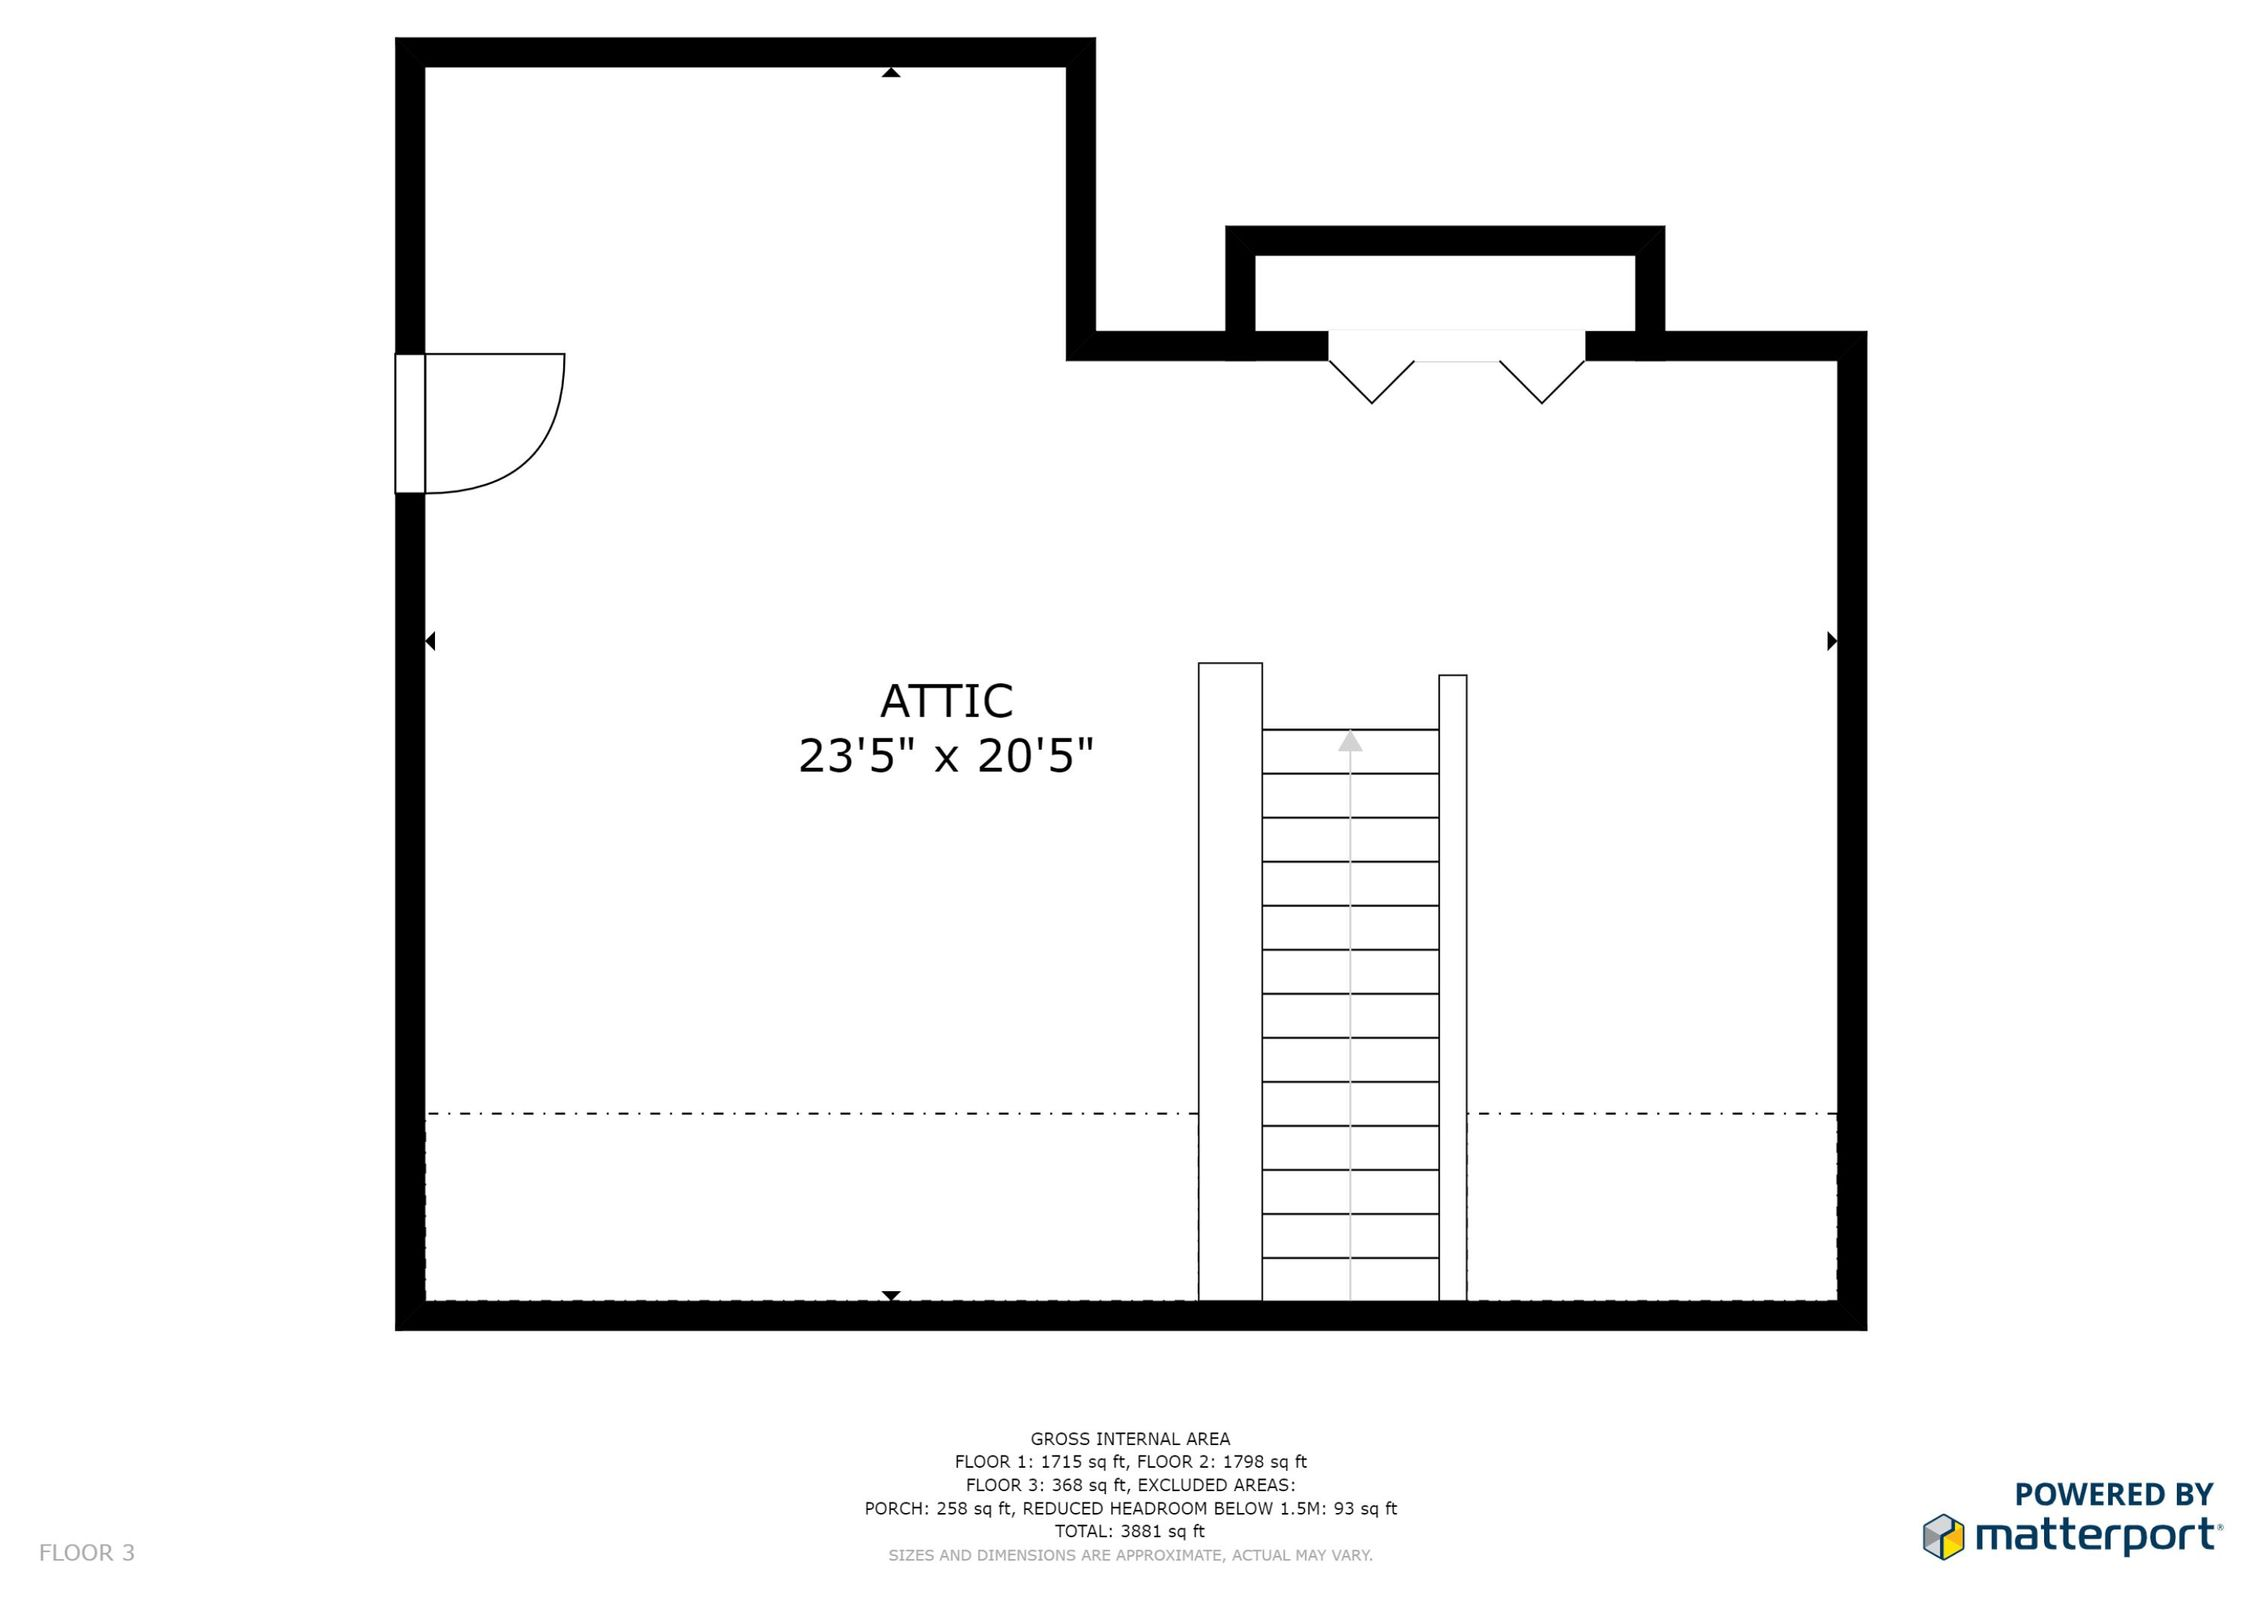 3rd Level Foor Plan